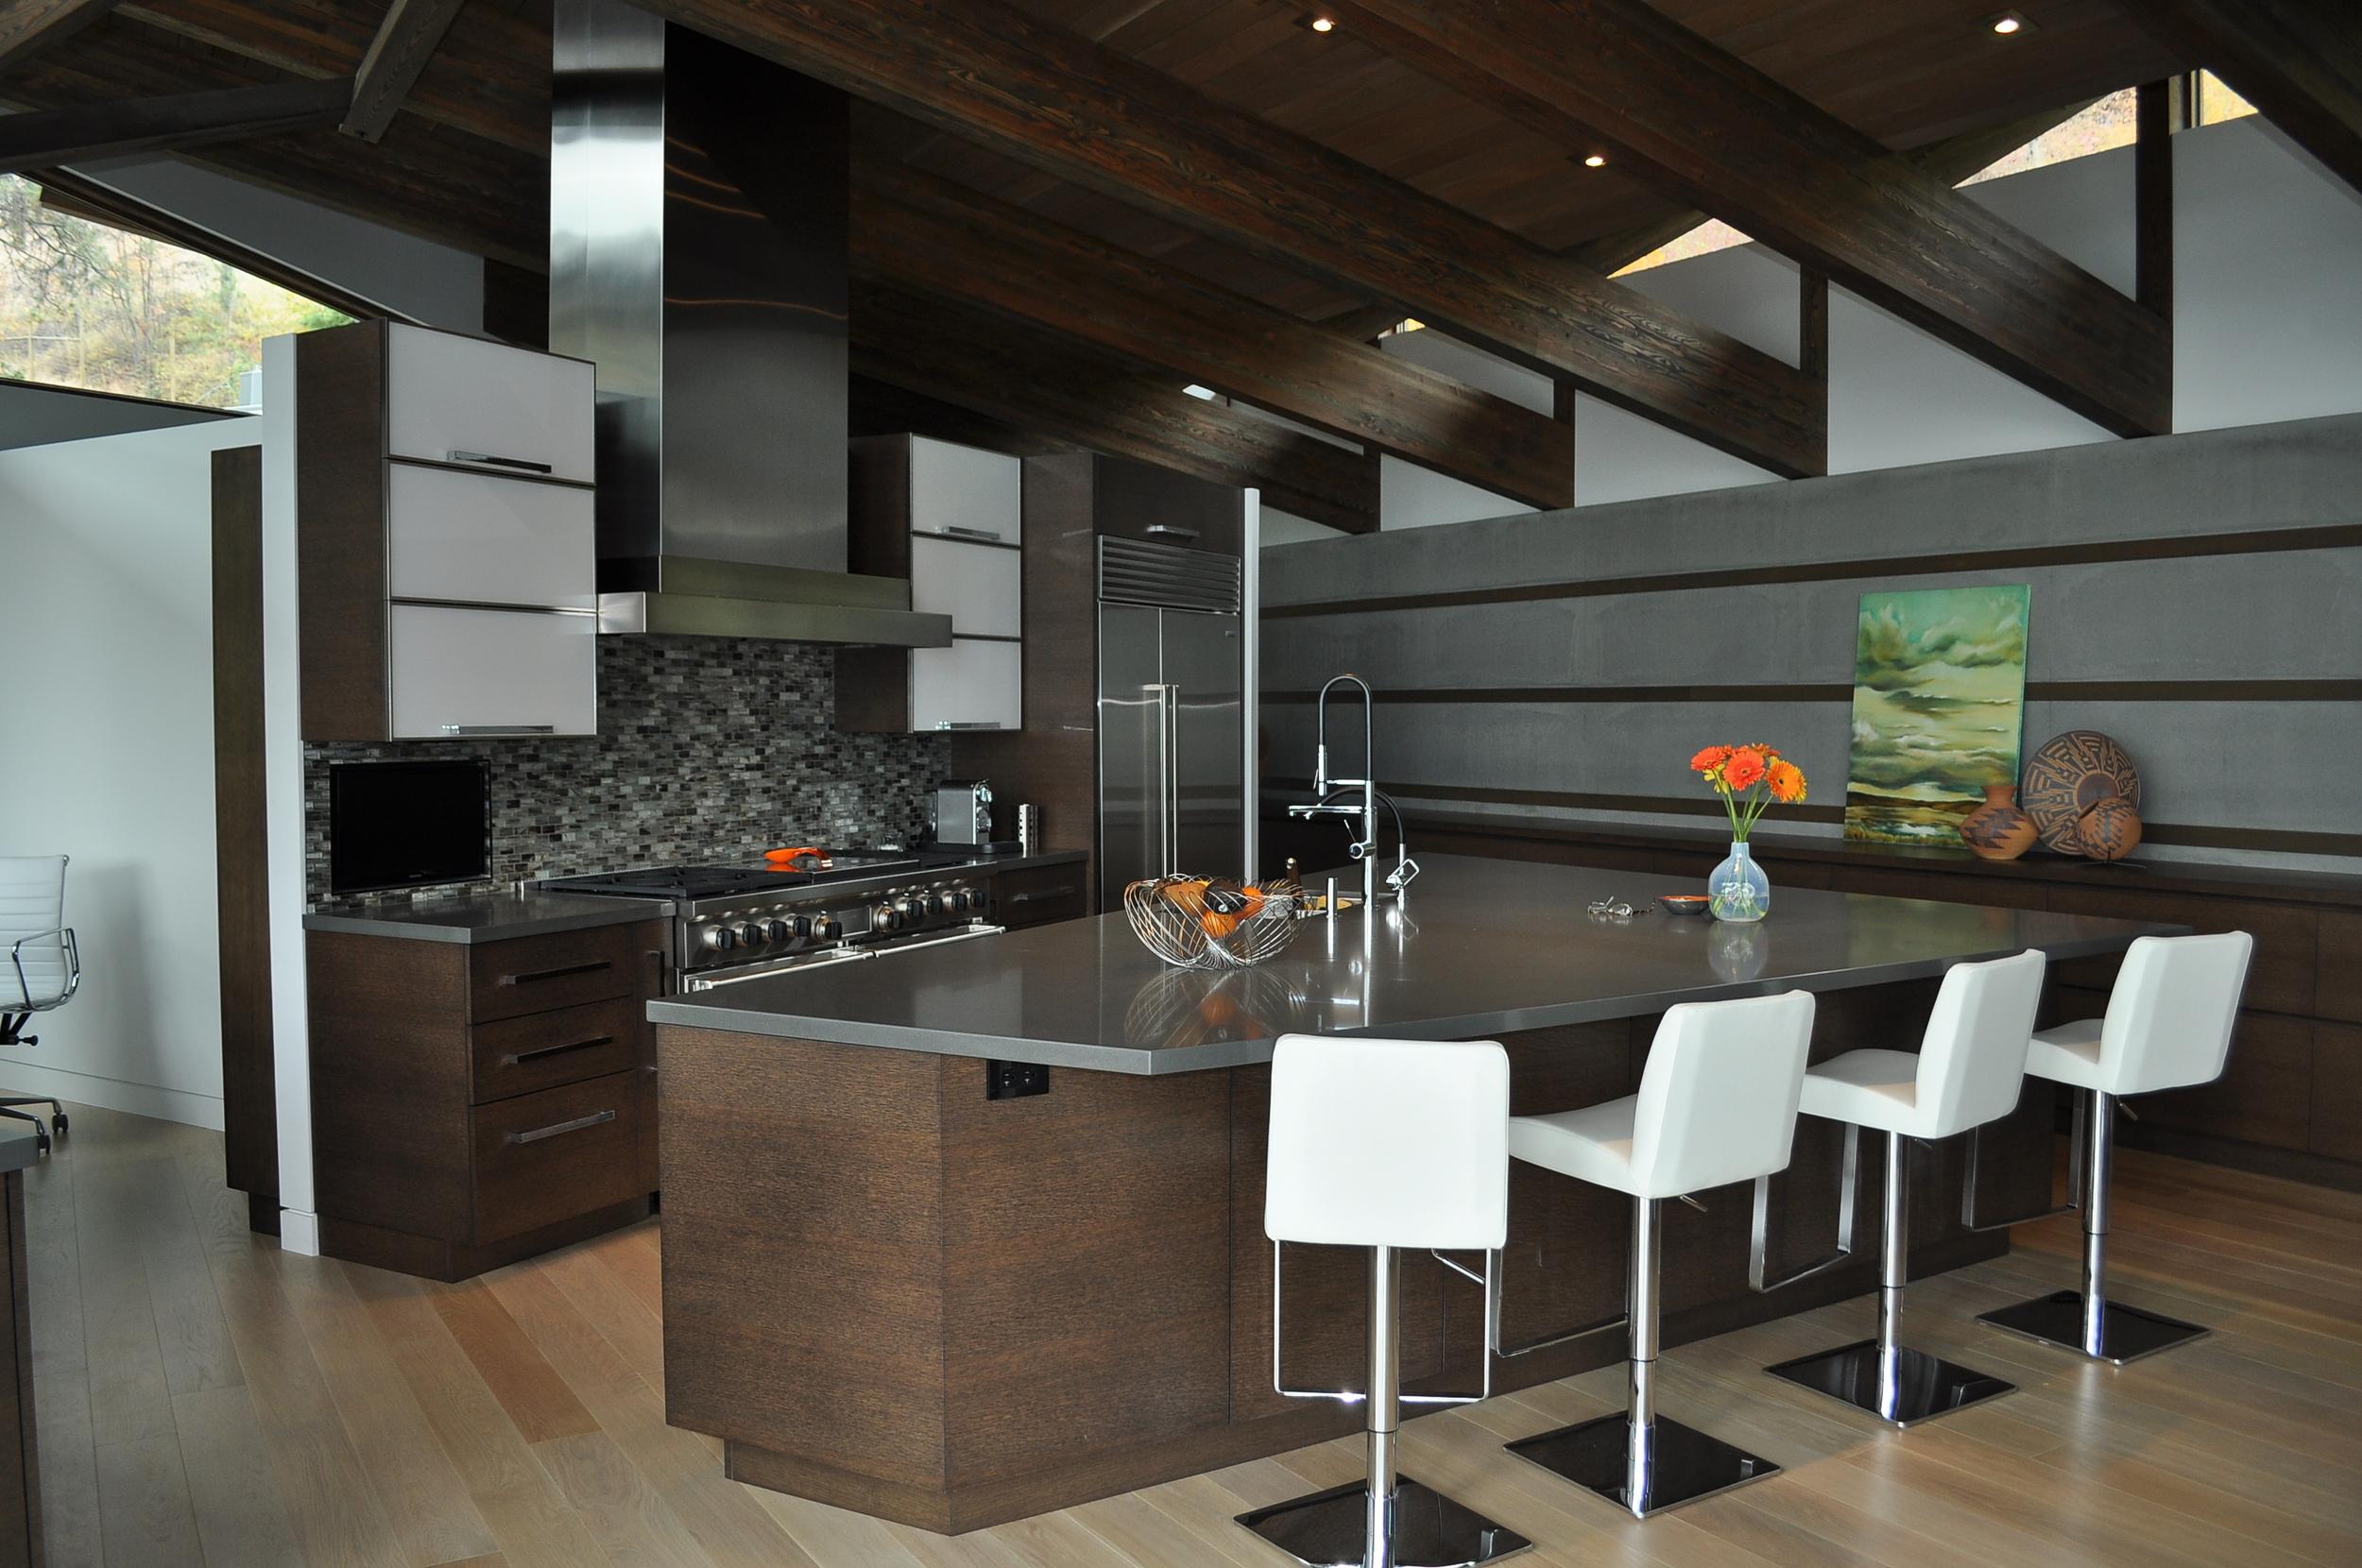 stained-white-oak-custom-kitchen-cabinetry.JPG